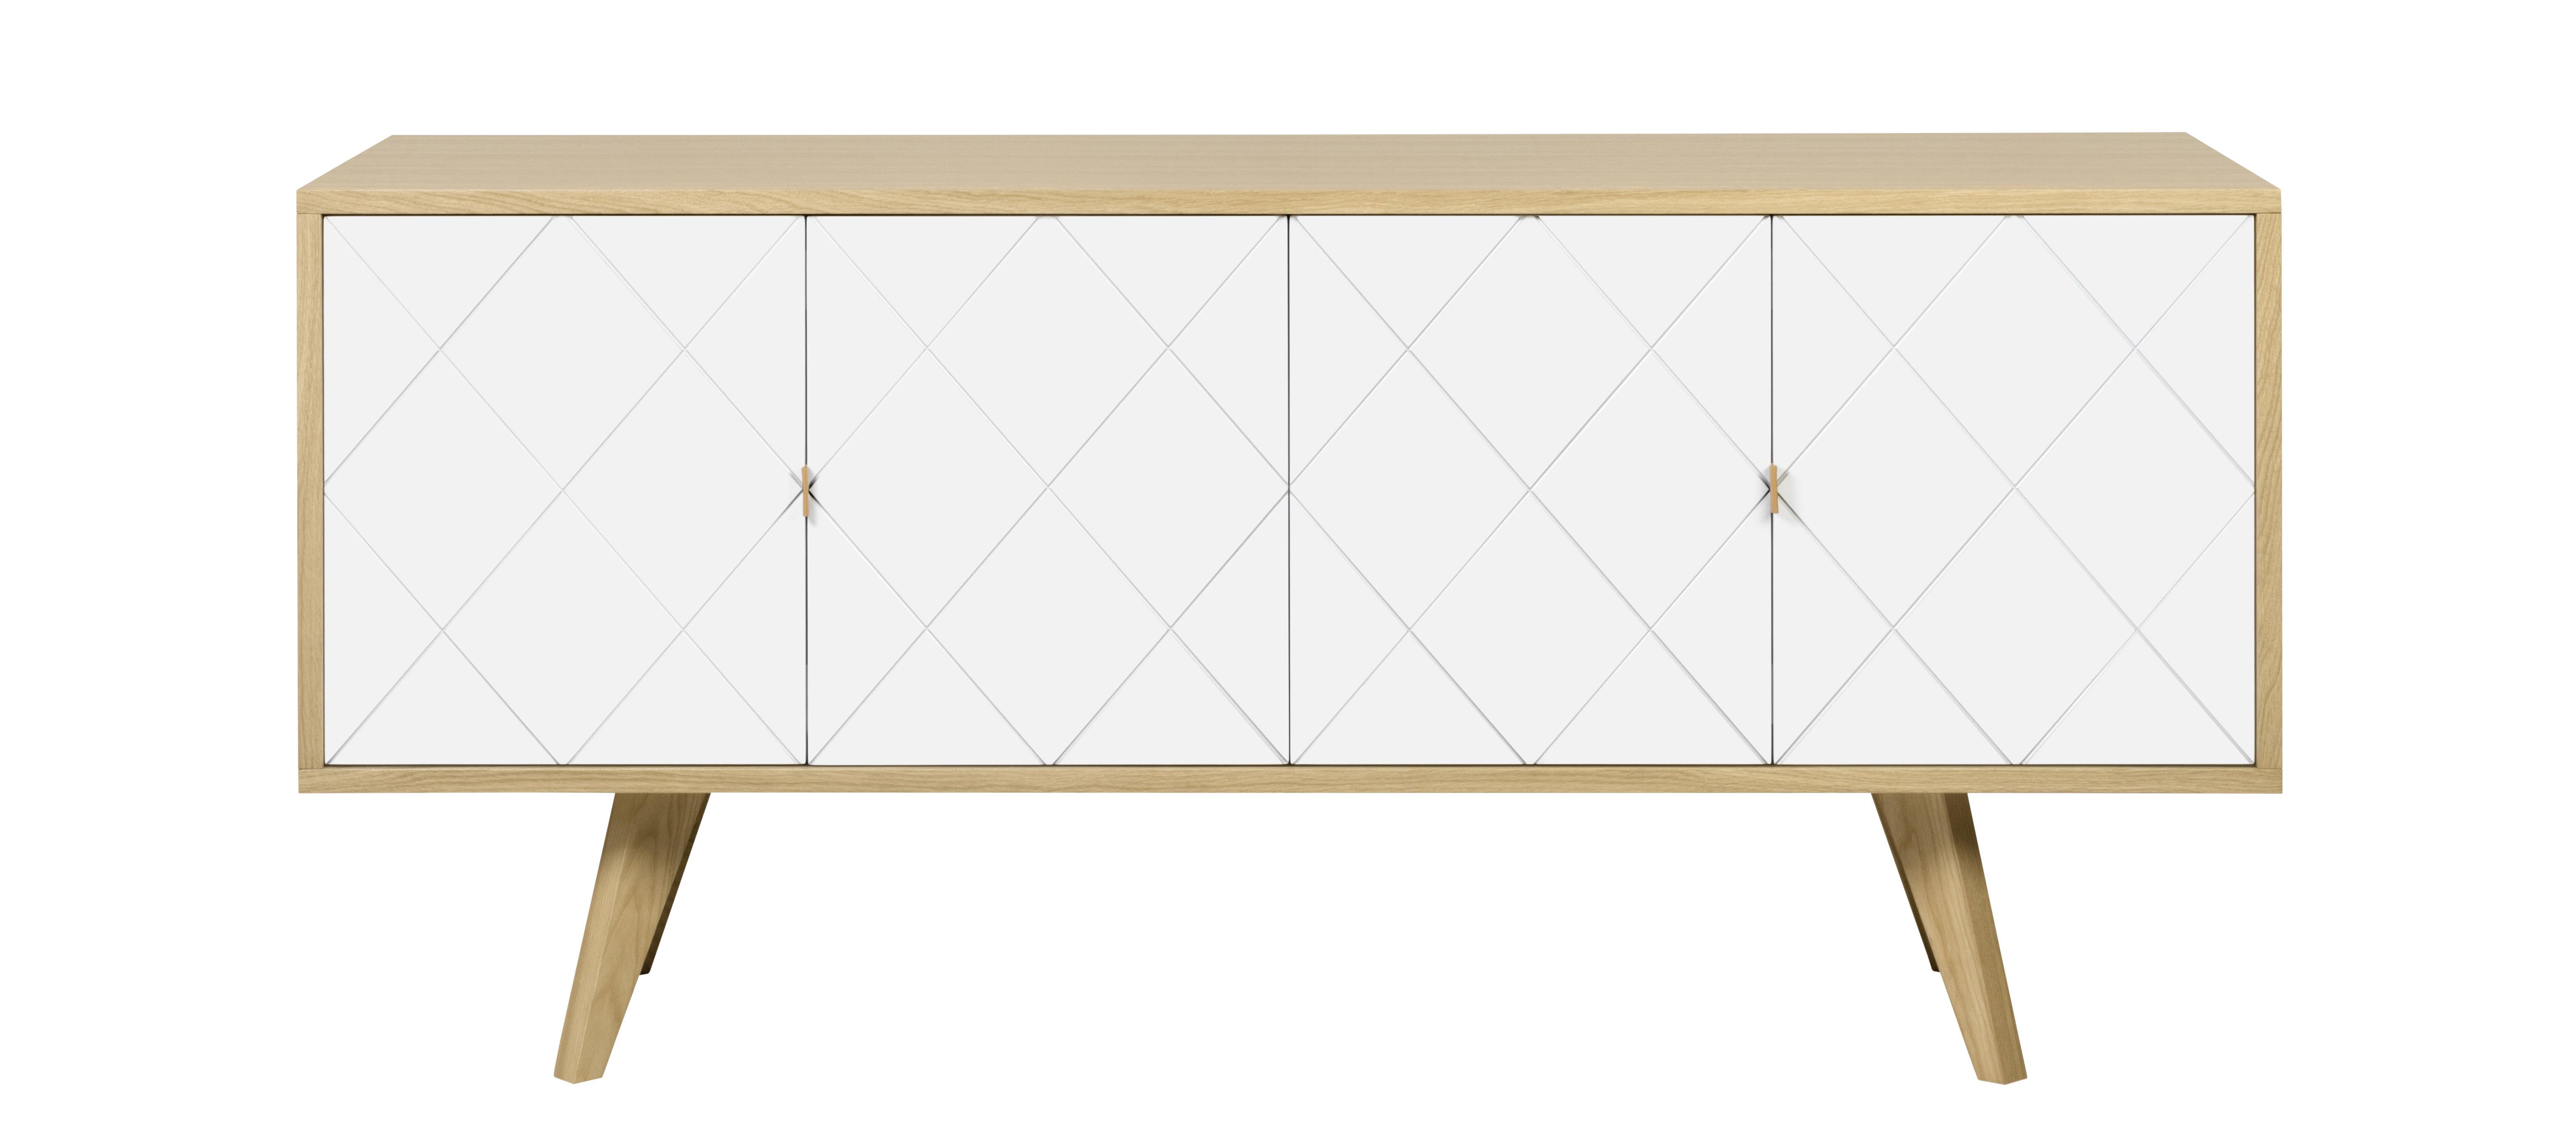 Furniture - Dressers & Storage Units - Butterfly Dresser - / L 160 cm by POP UP HOME - Oak / White - Oak plywood, Painted chipboard, Solid oak